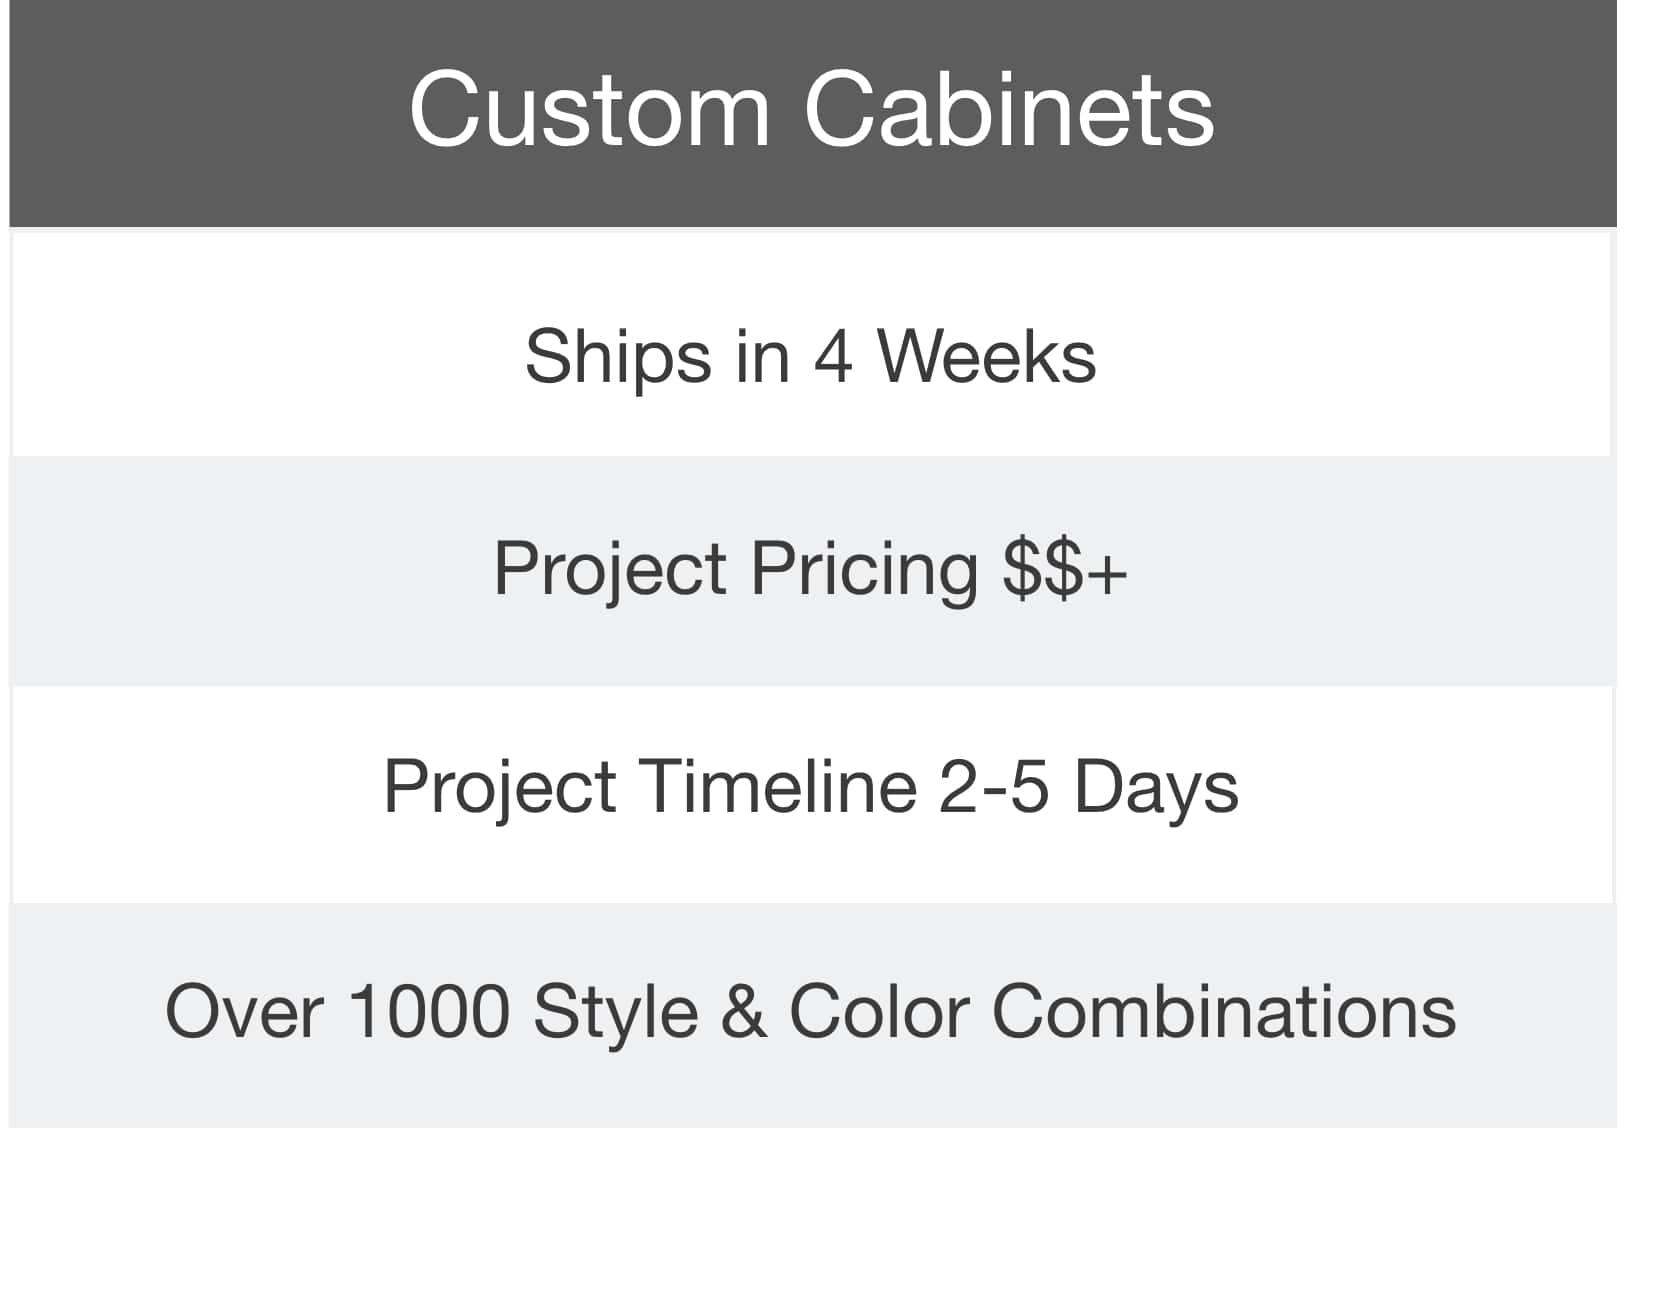 custom cabinets comparison chart